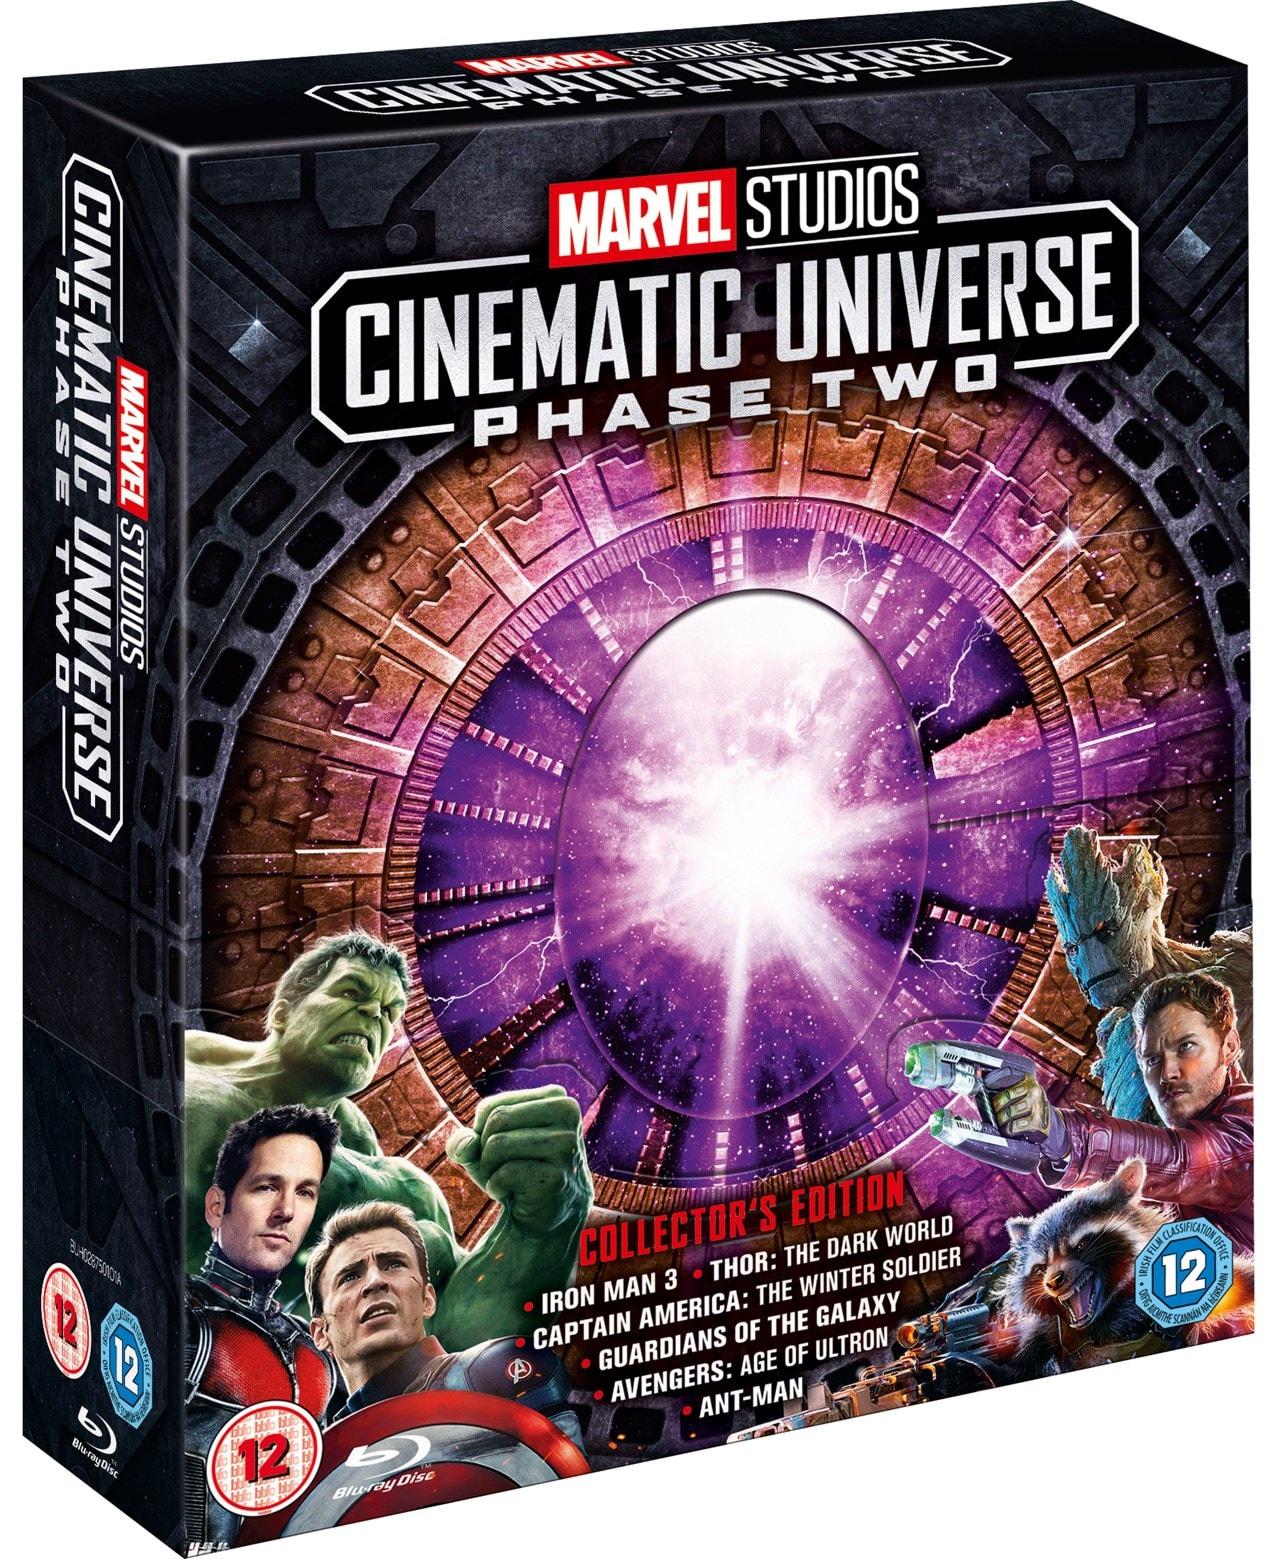 Marvel Studios Cinematic Universe: Phase Two - 2